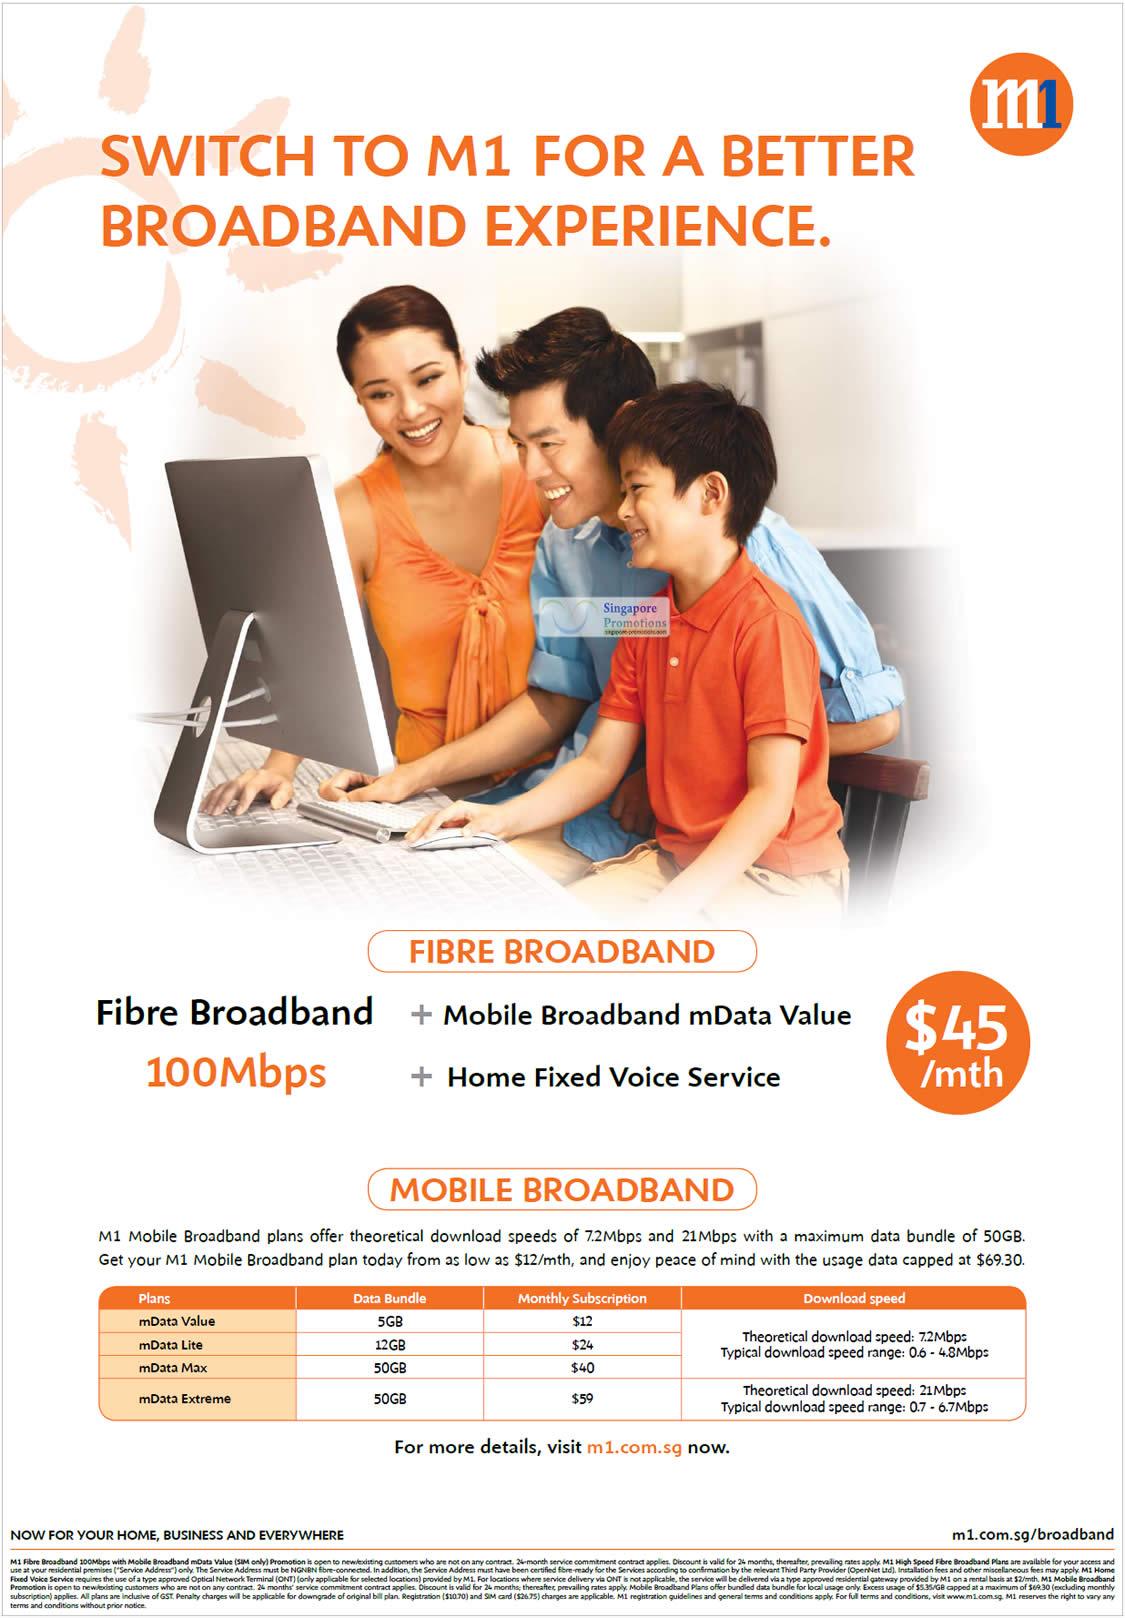 45 Dollar Fibre Broadband 100Mbps, Mobile Broadband